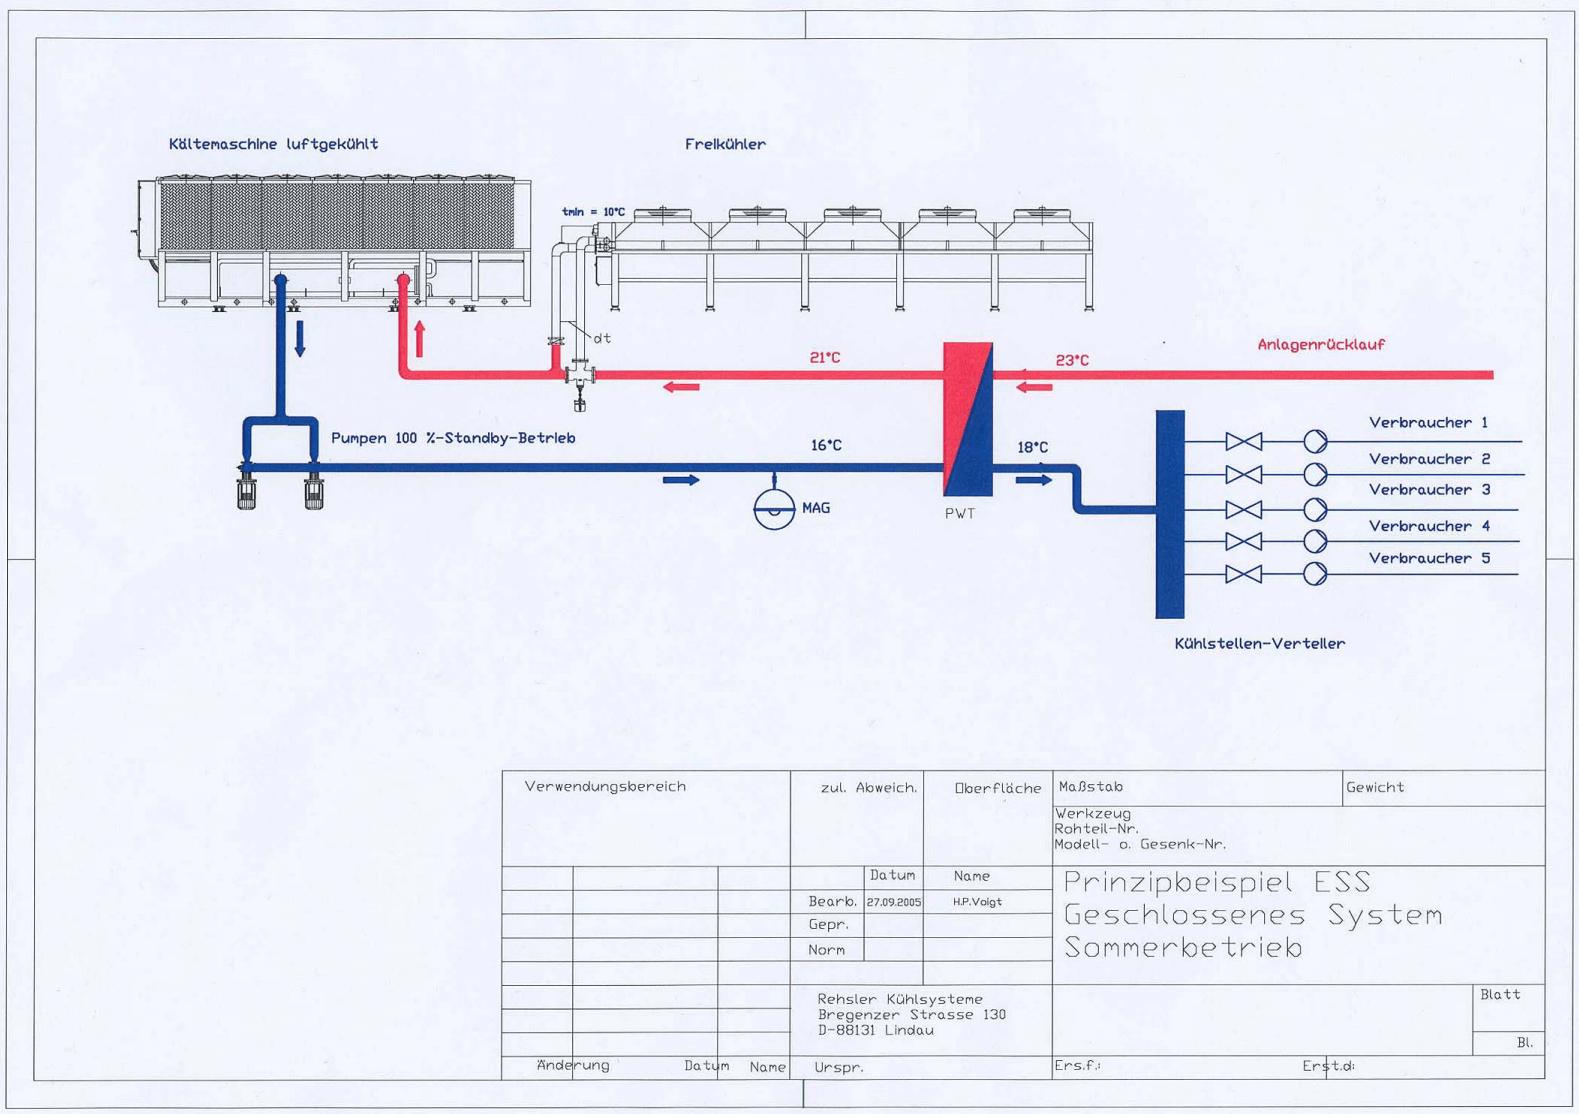 Prinzipbeispiel Energiesparsystem - geschlossenes System Sommerbetrieb